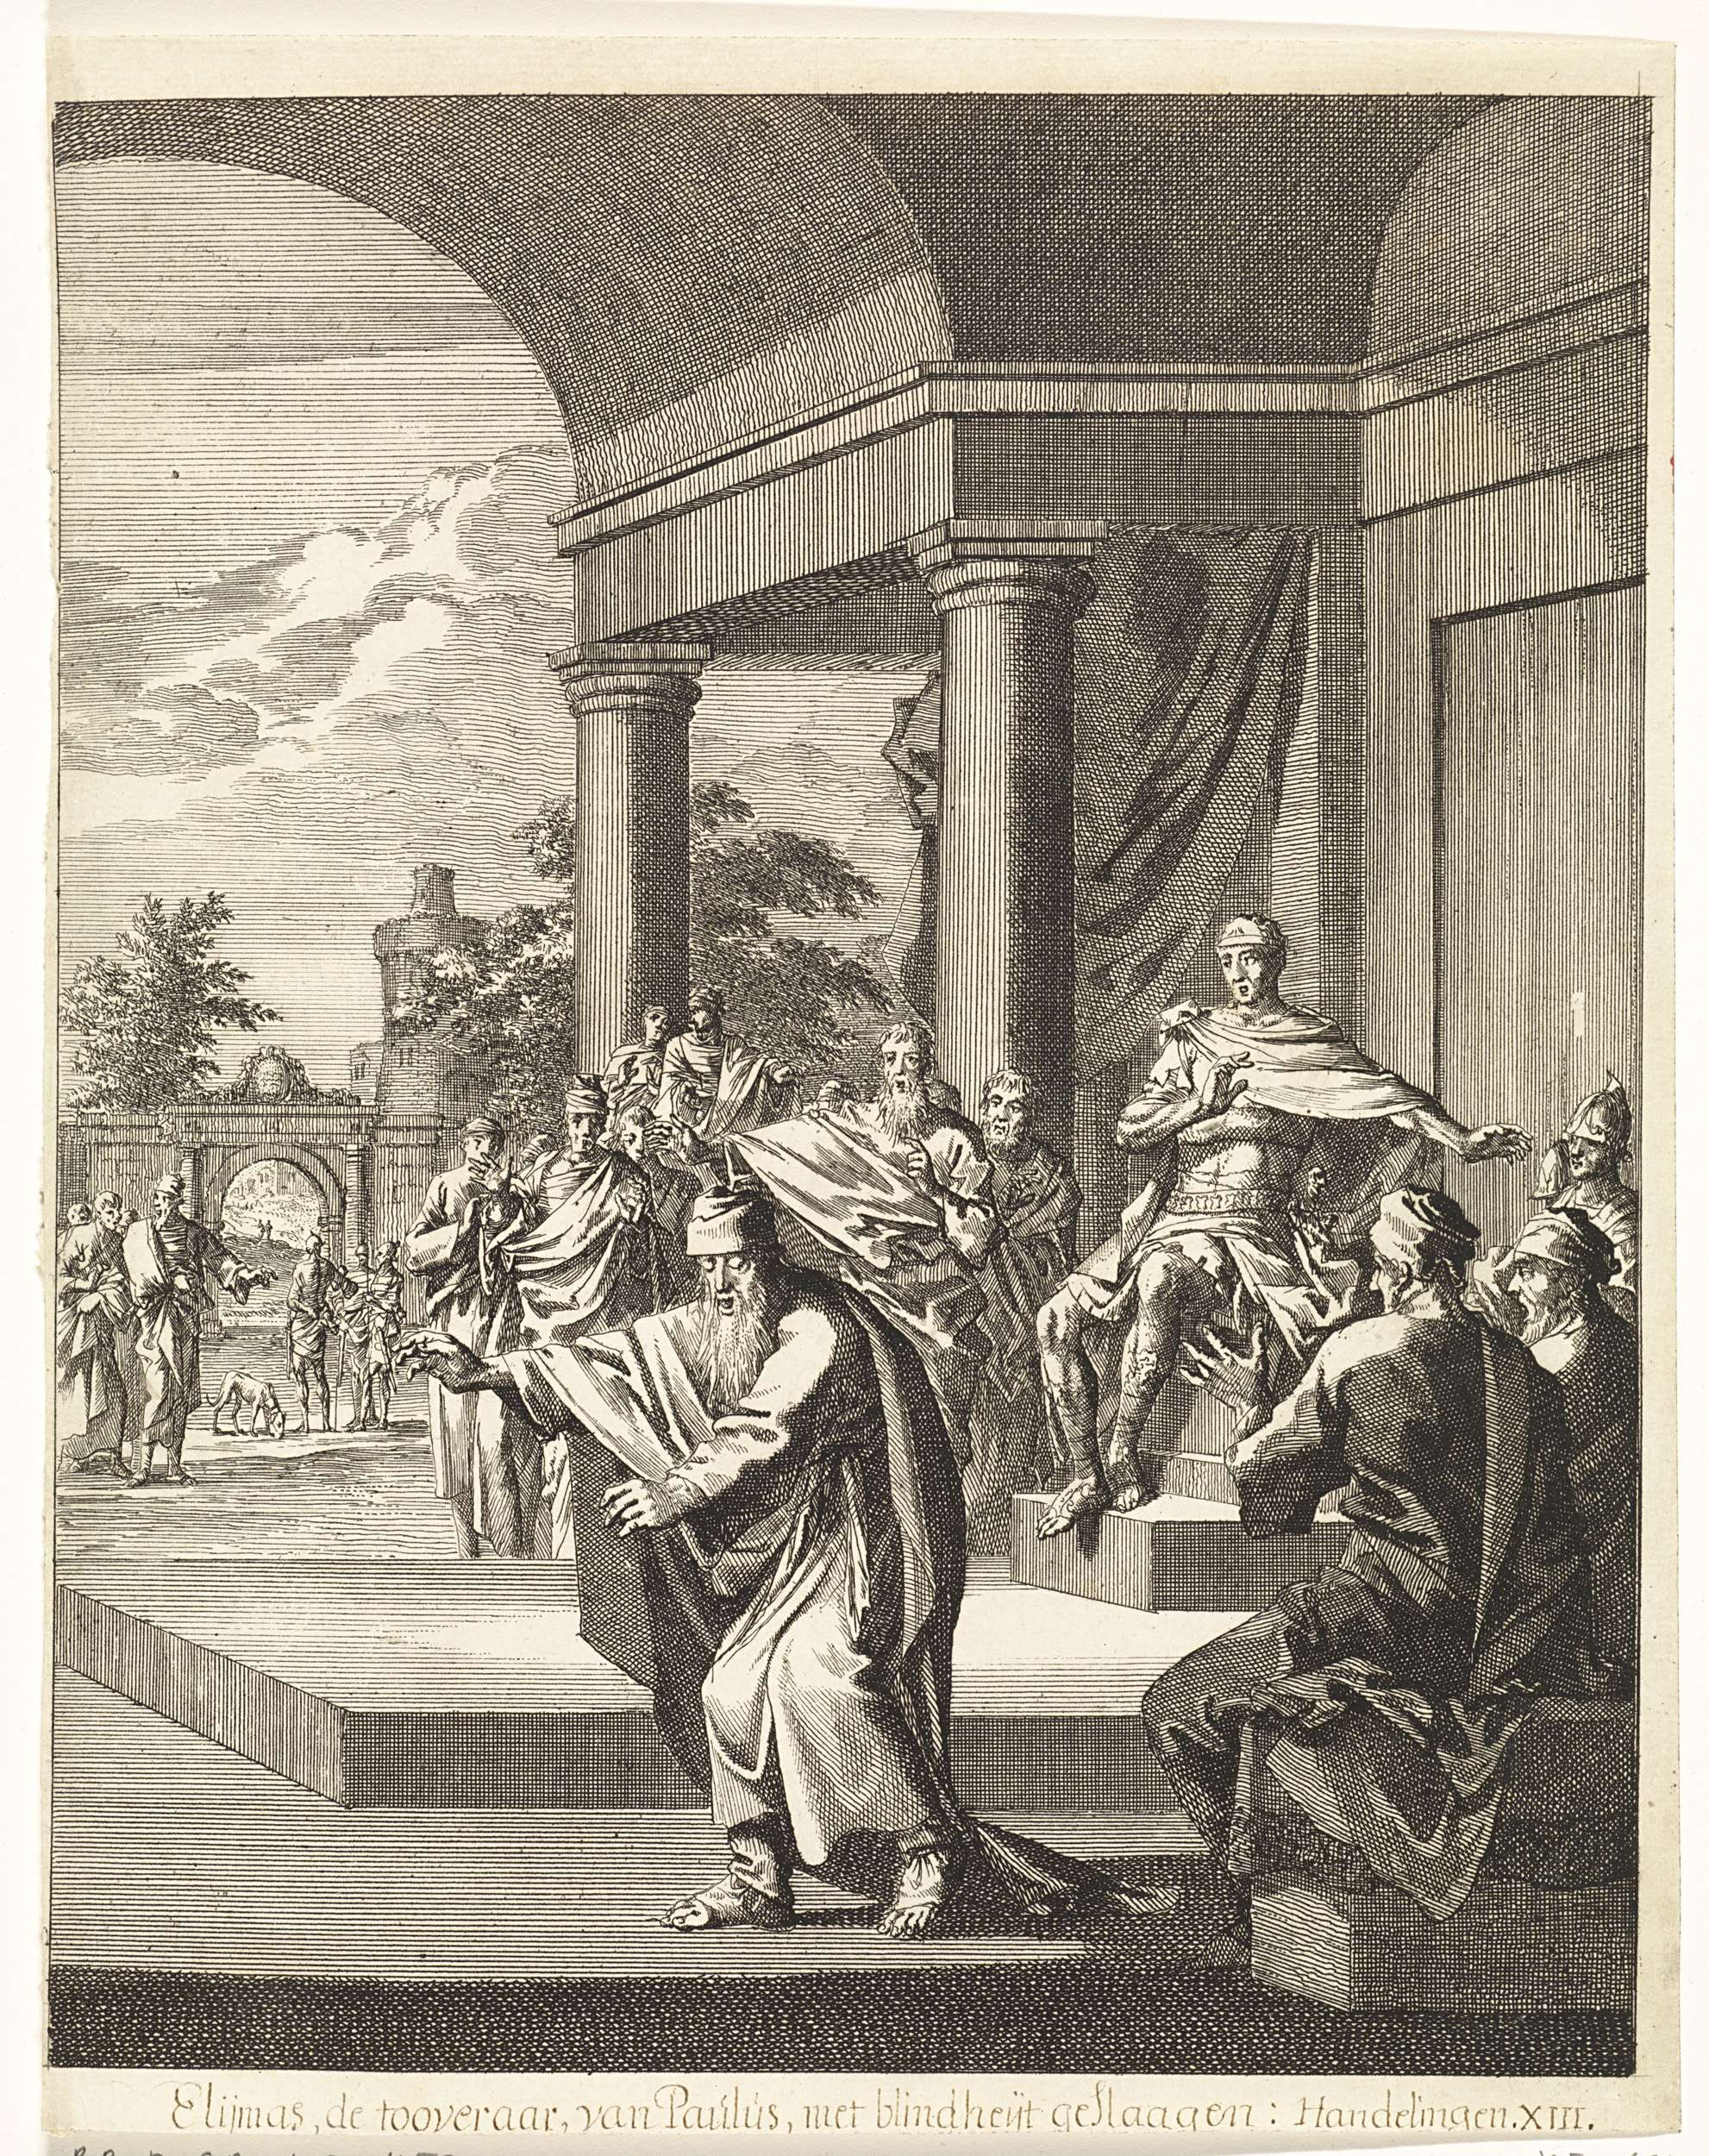 Jan Luyken | Paulus maakt Elymas blind, Jan Luyken, Christoph Weigel, 1708 |